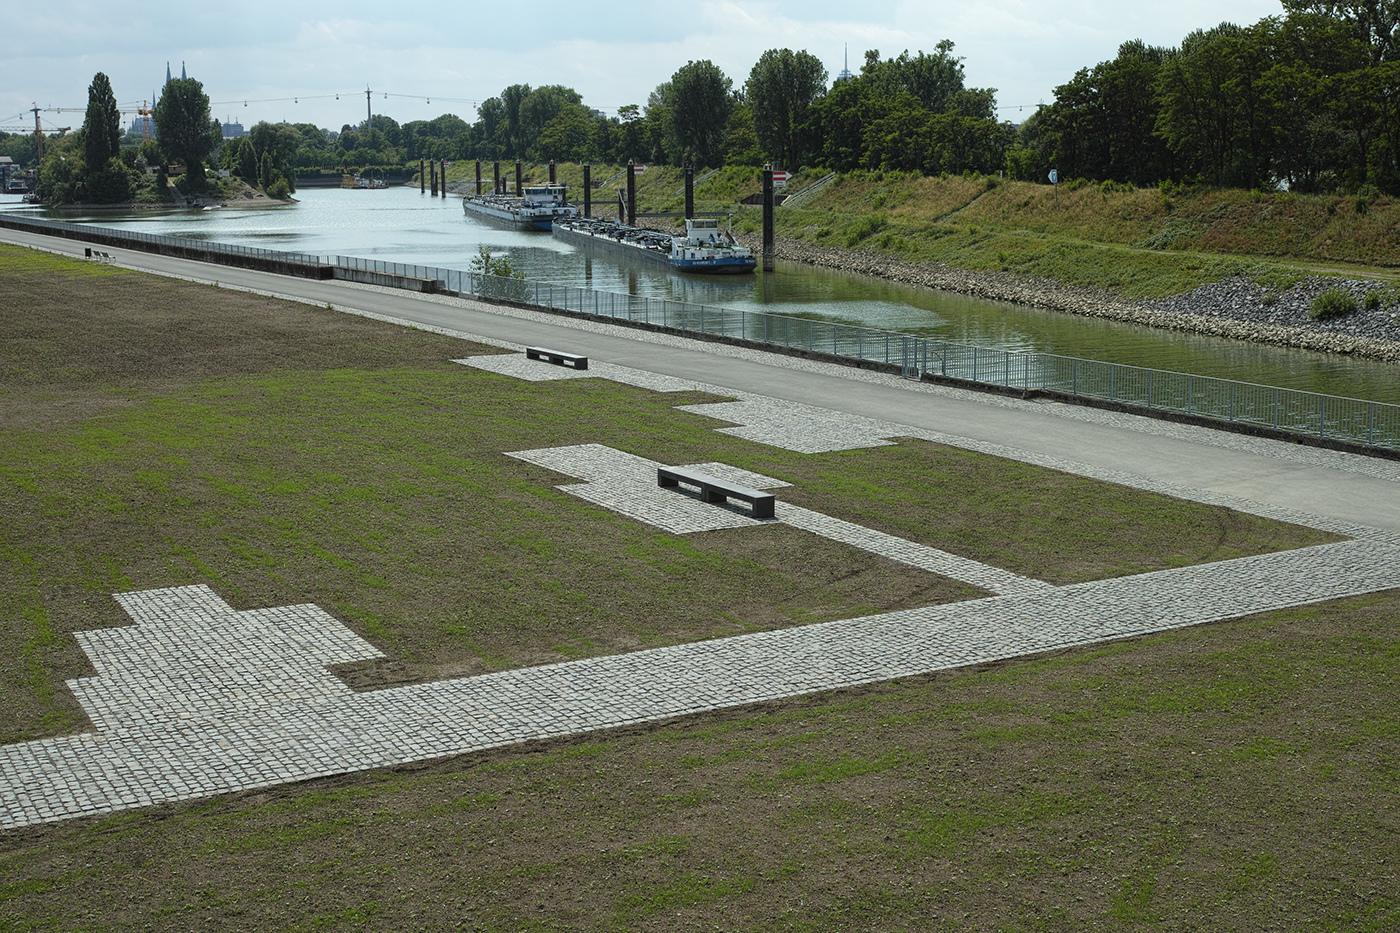 betonbank / concrete bench lige, rheinboulebard cologne on behance